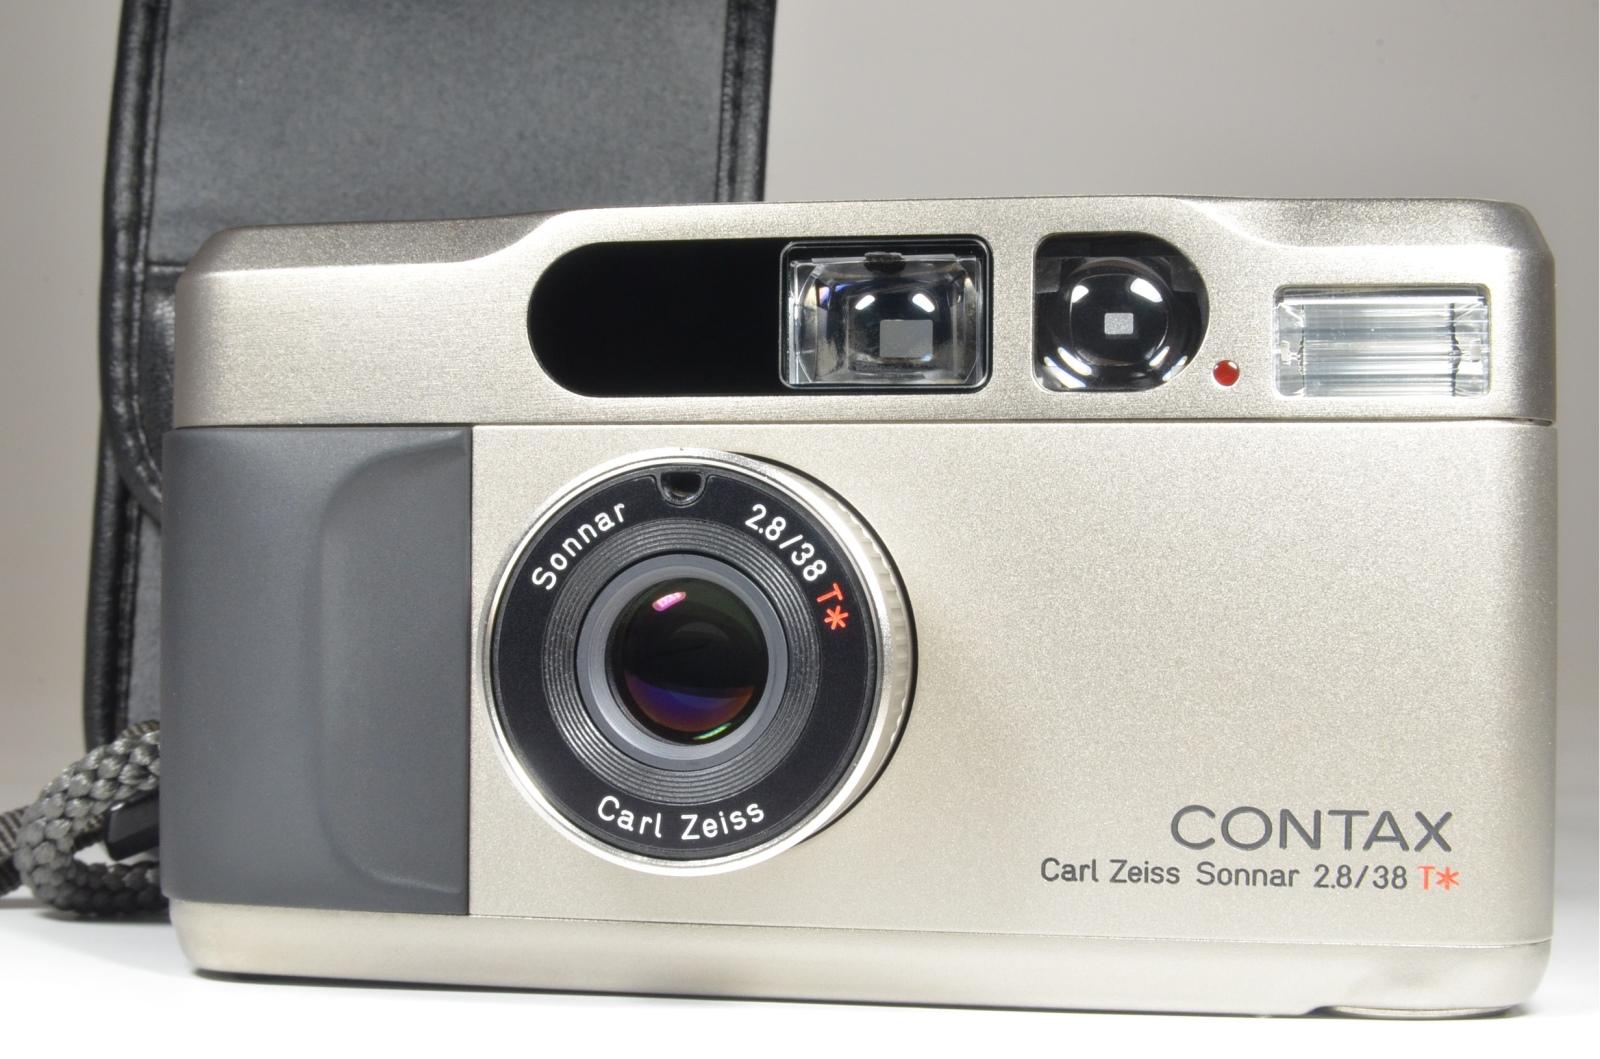 contax t2 data back titanium silver p&s 35mm film camera